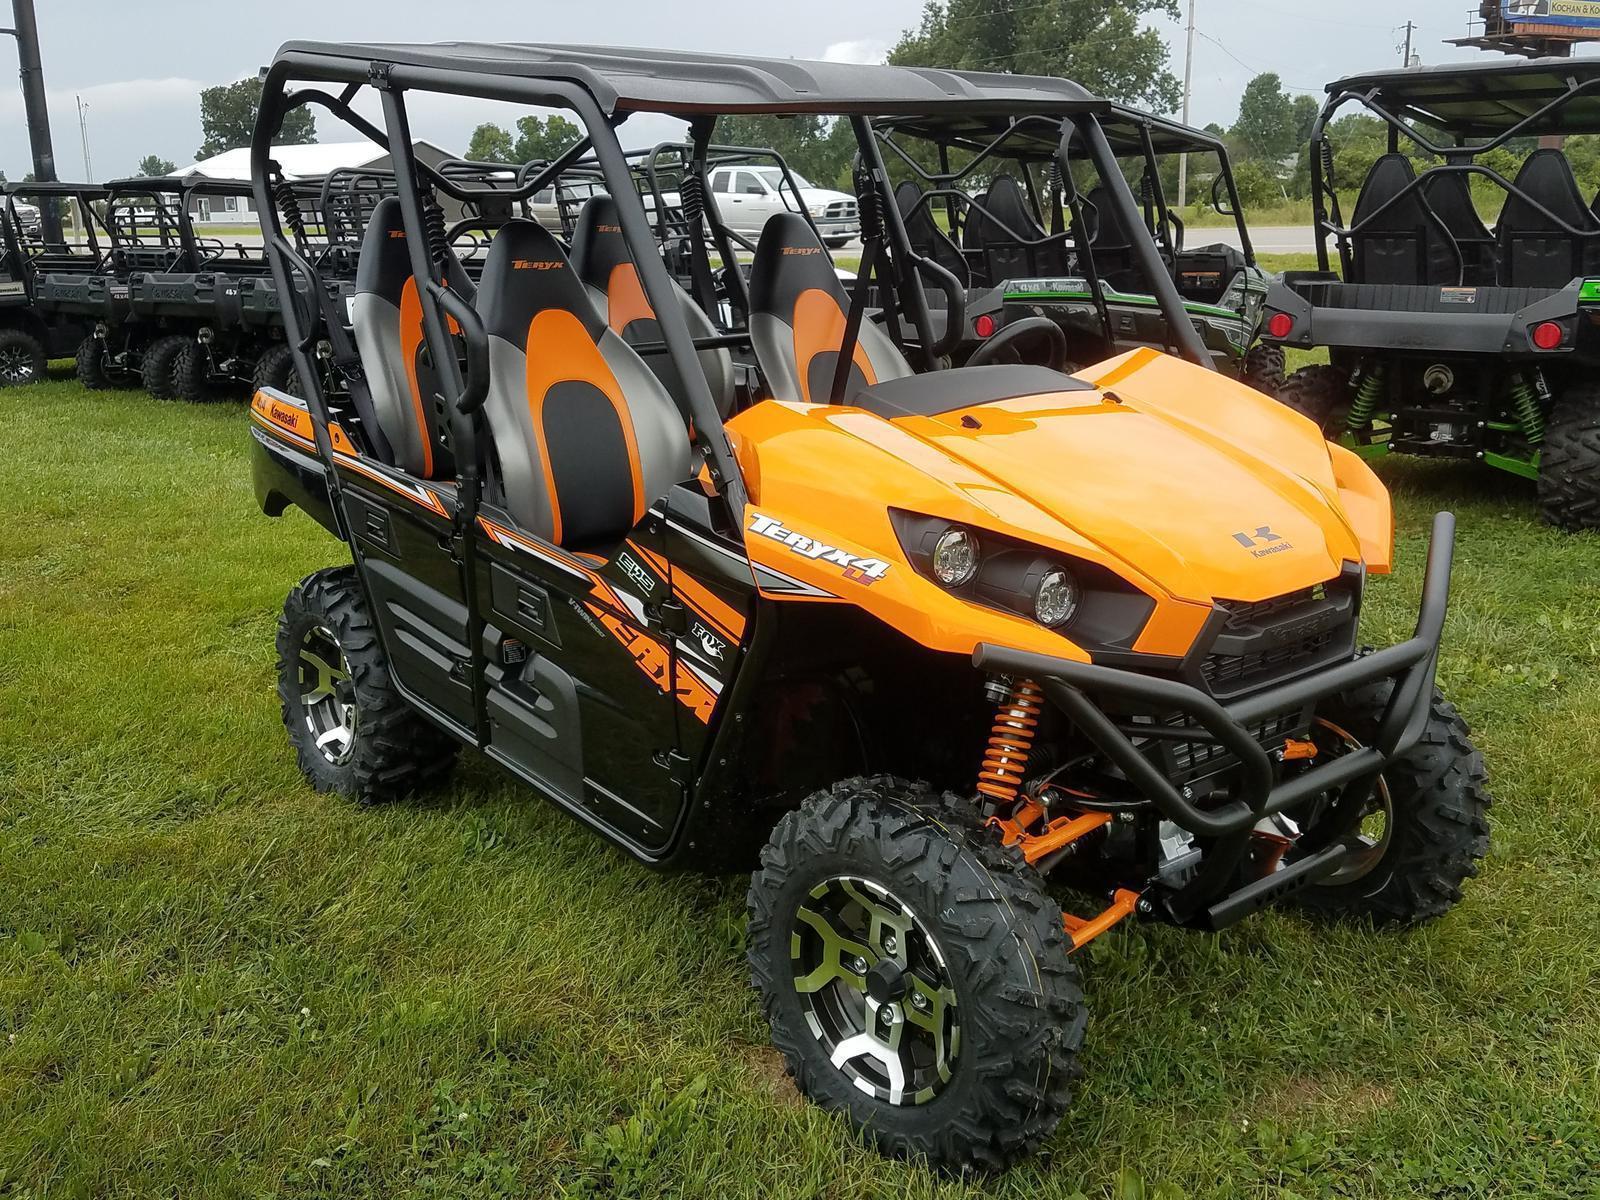 1e4b189e2b 2019 Kawasaki TERYX4 LE for sale in Herrin, IL. Good Guys ...